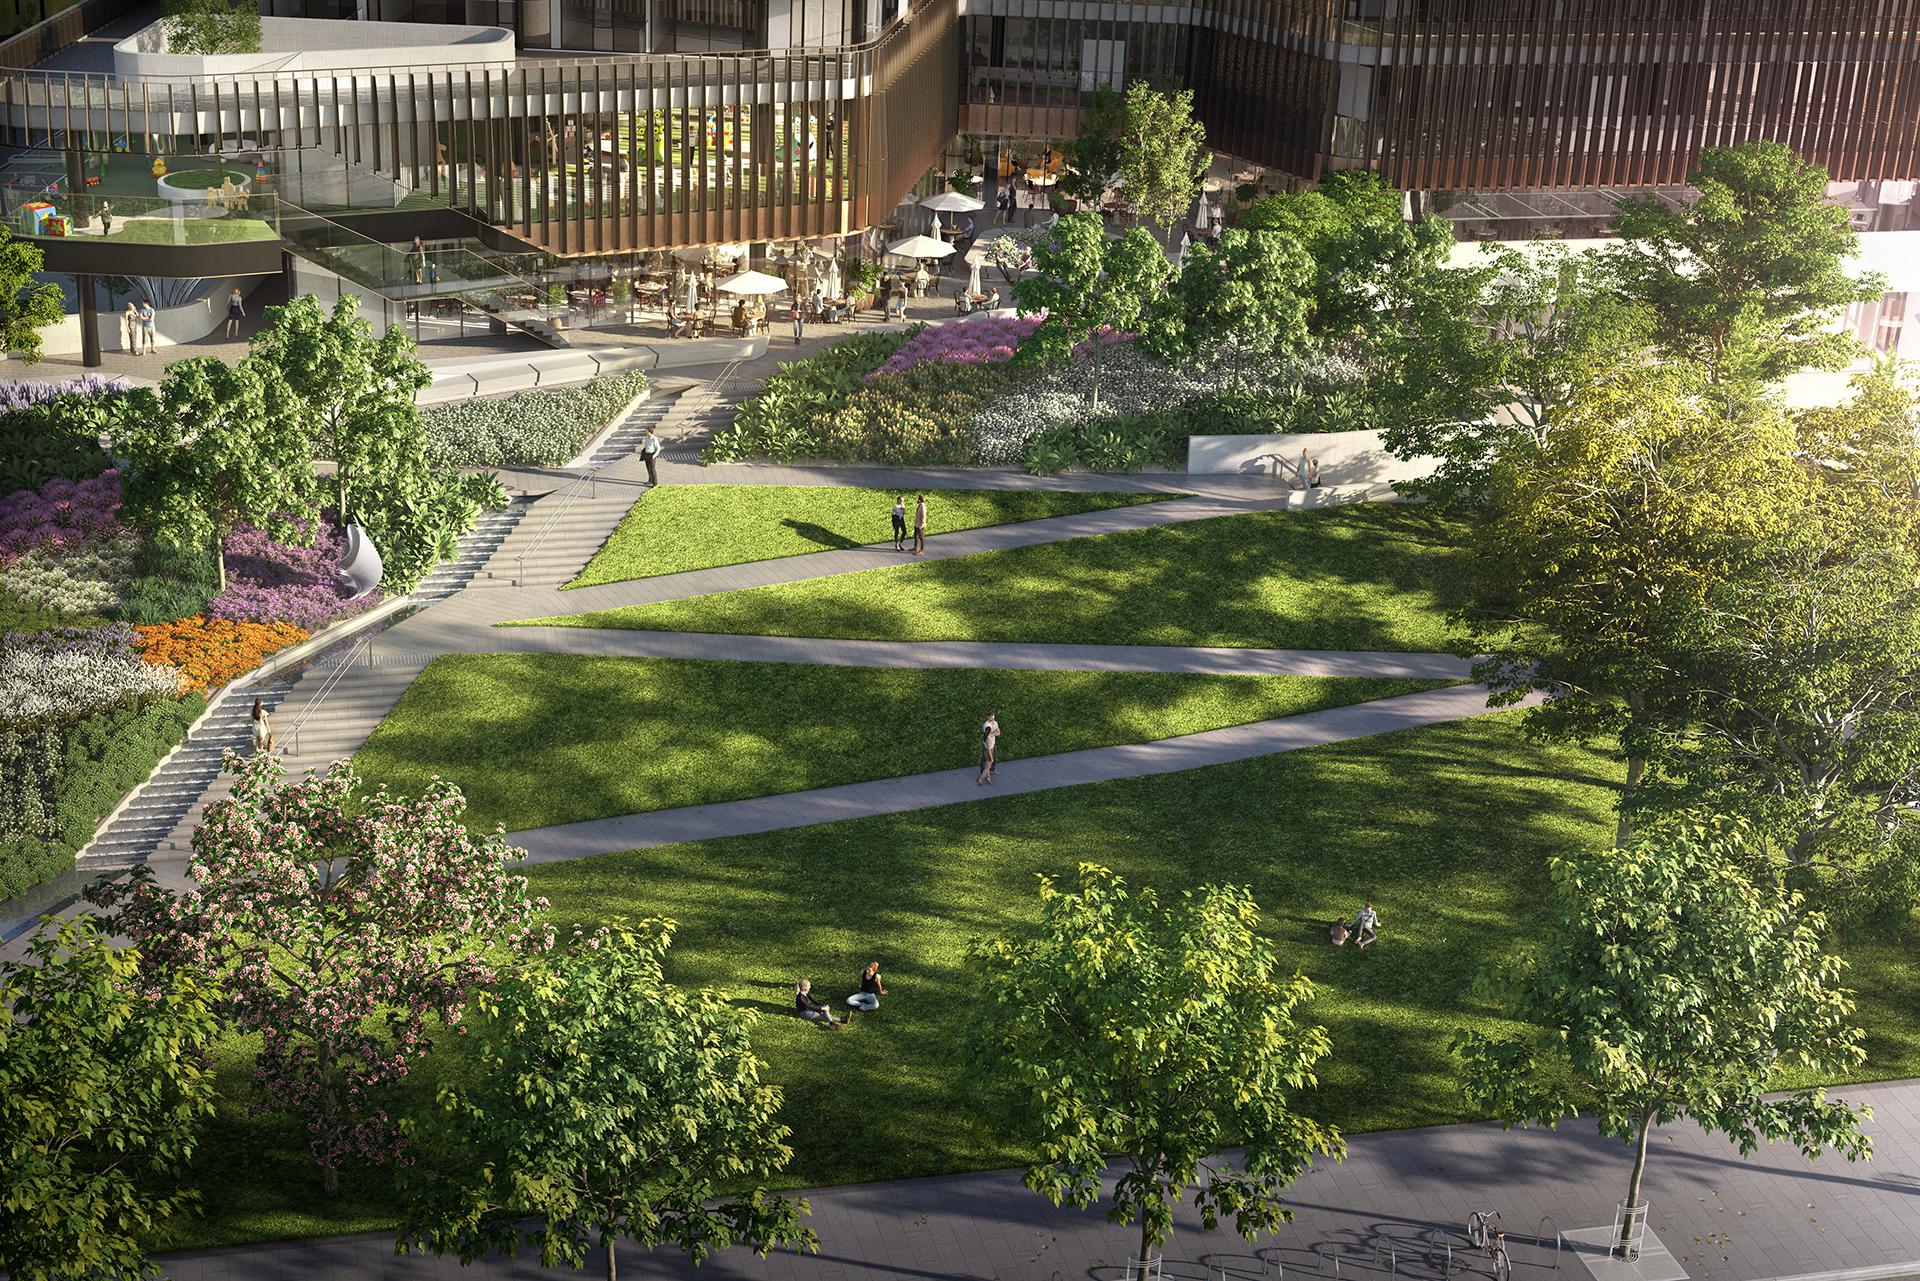 OSKH9386 Melbourne Square EA06 Aerial Park   Copy